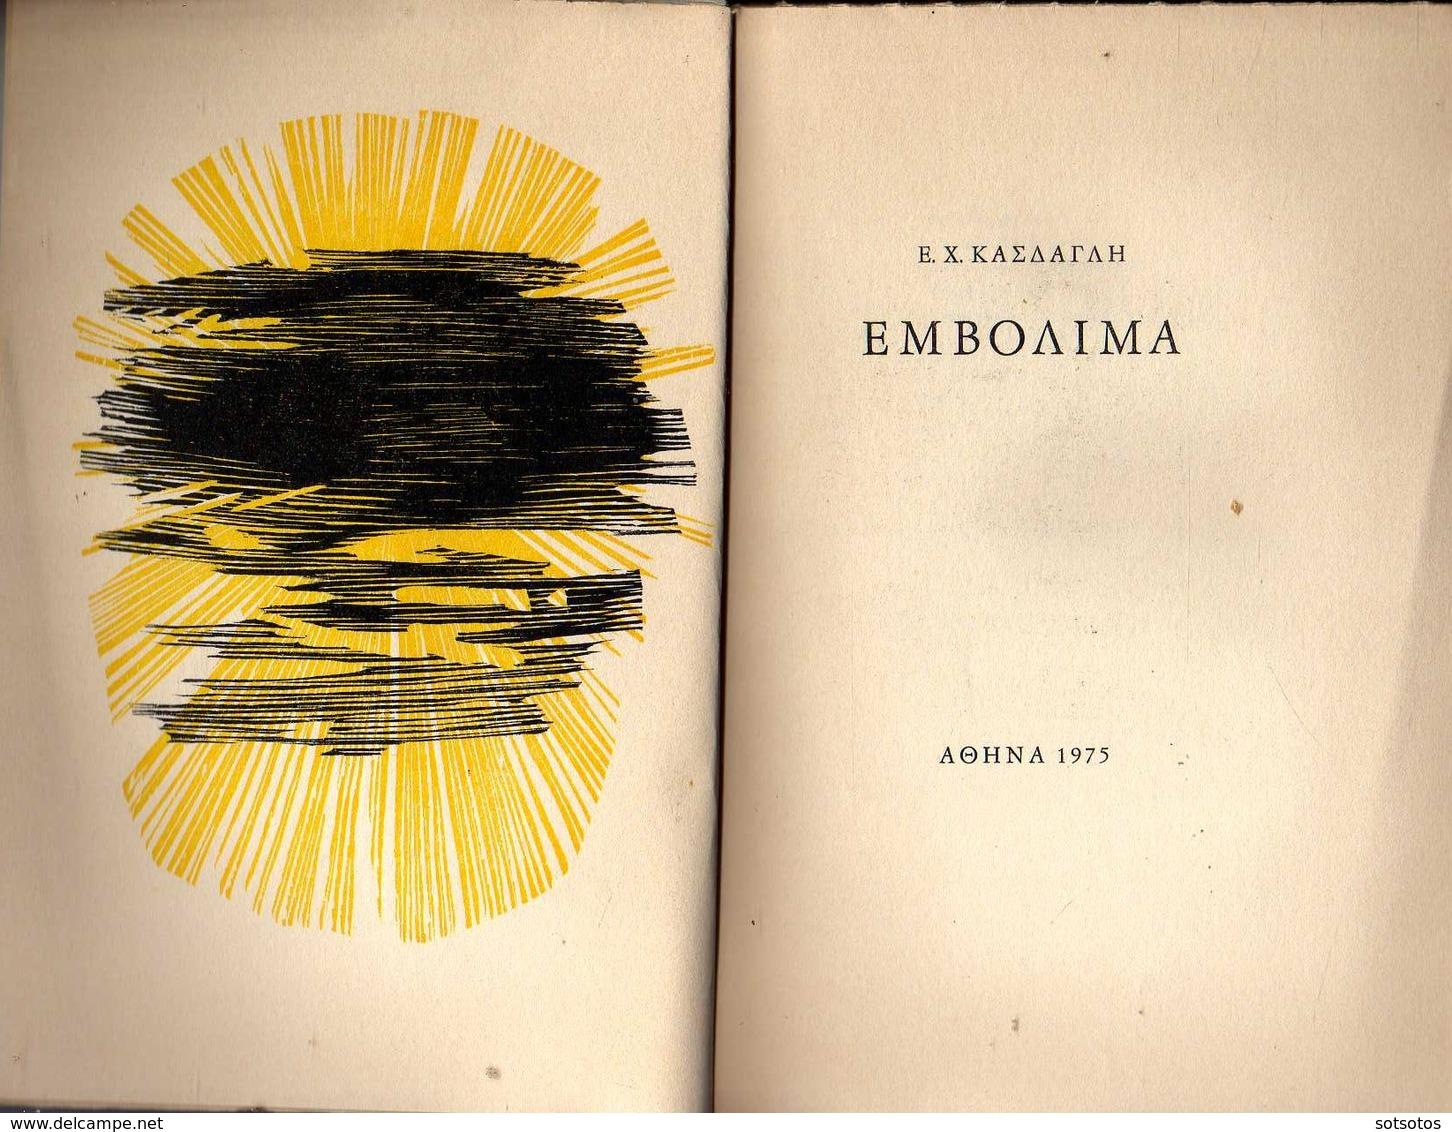 GREEK BOOK - E.H. KASDAGLI, POEMS, Athens 1975  Ε.Χ. ΚΑΣΔΑΓΛΗ: ΕΜΒΟΛΙΜΑ, Ποιήματα - ΑΘΗΝΑ (1975) - Poetry